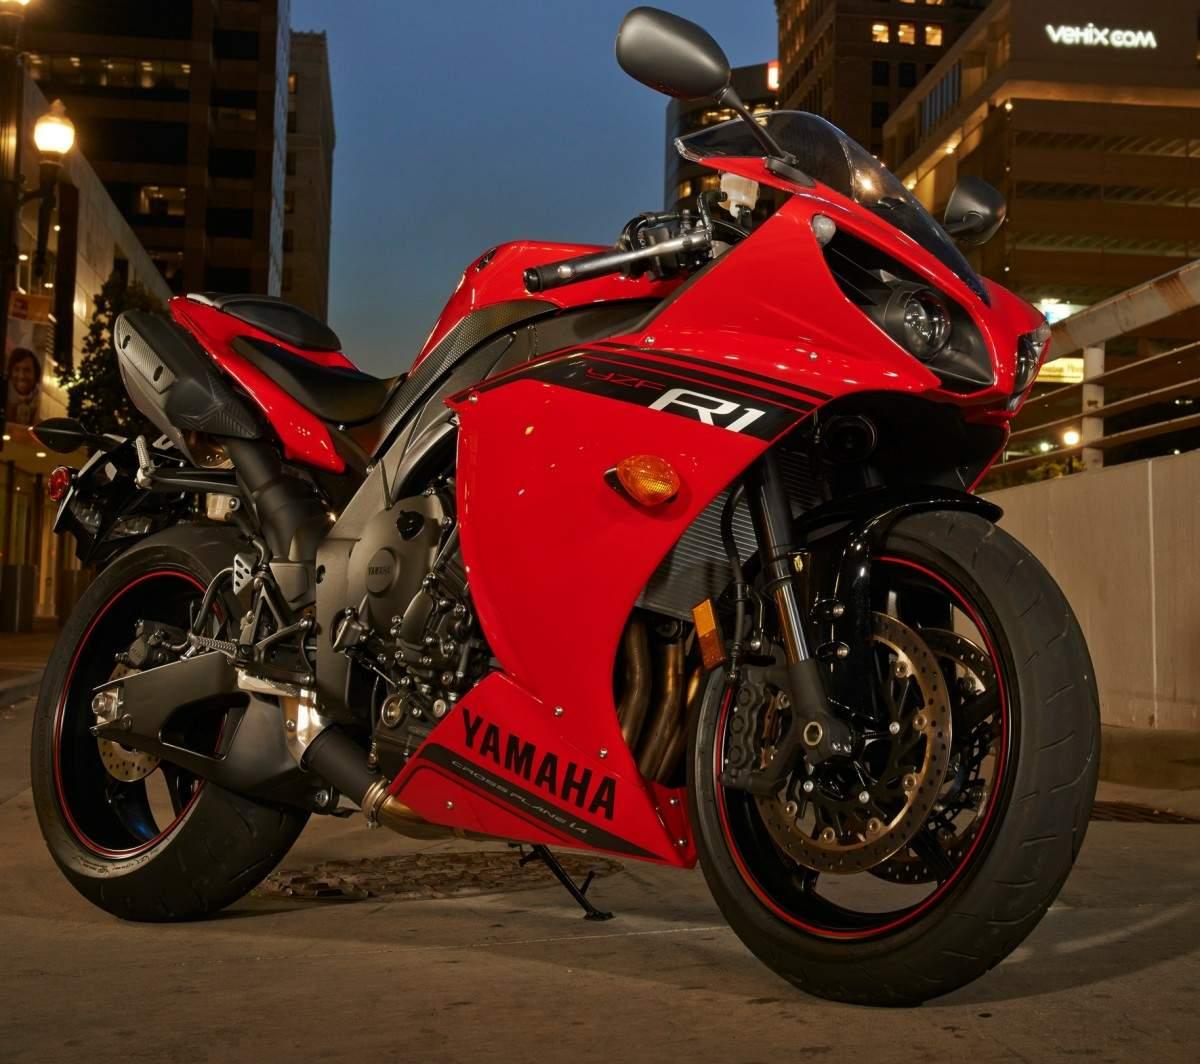 фото мотоцикла ямаха р1 #7